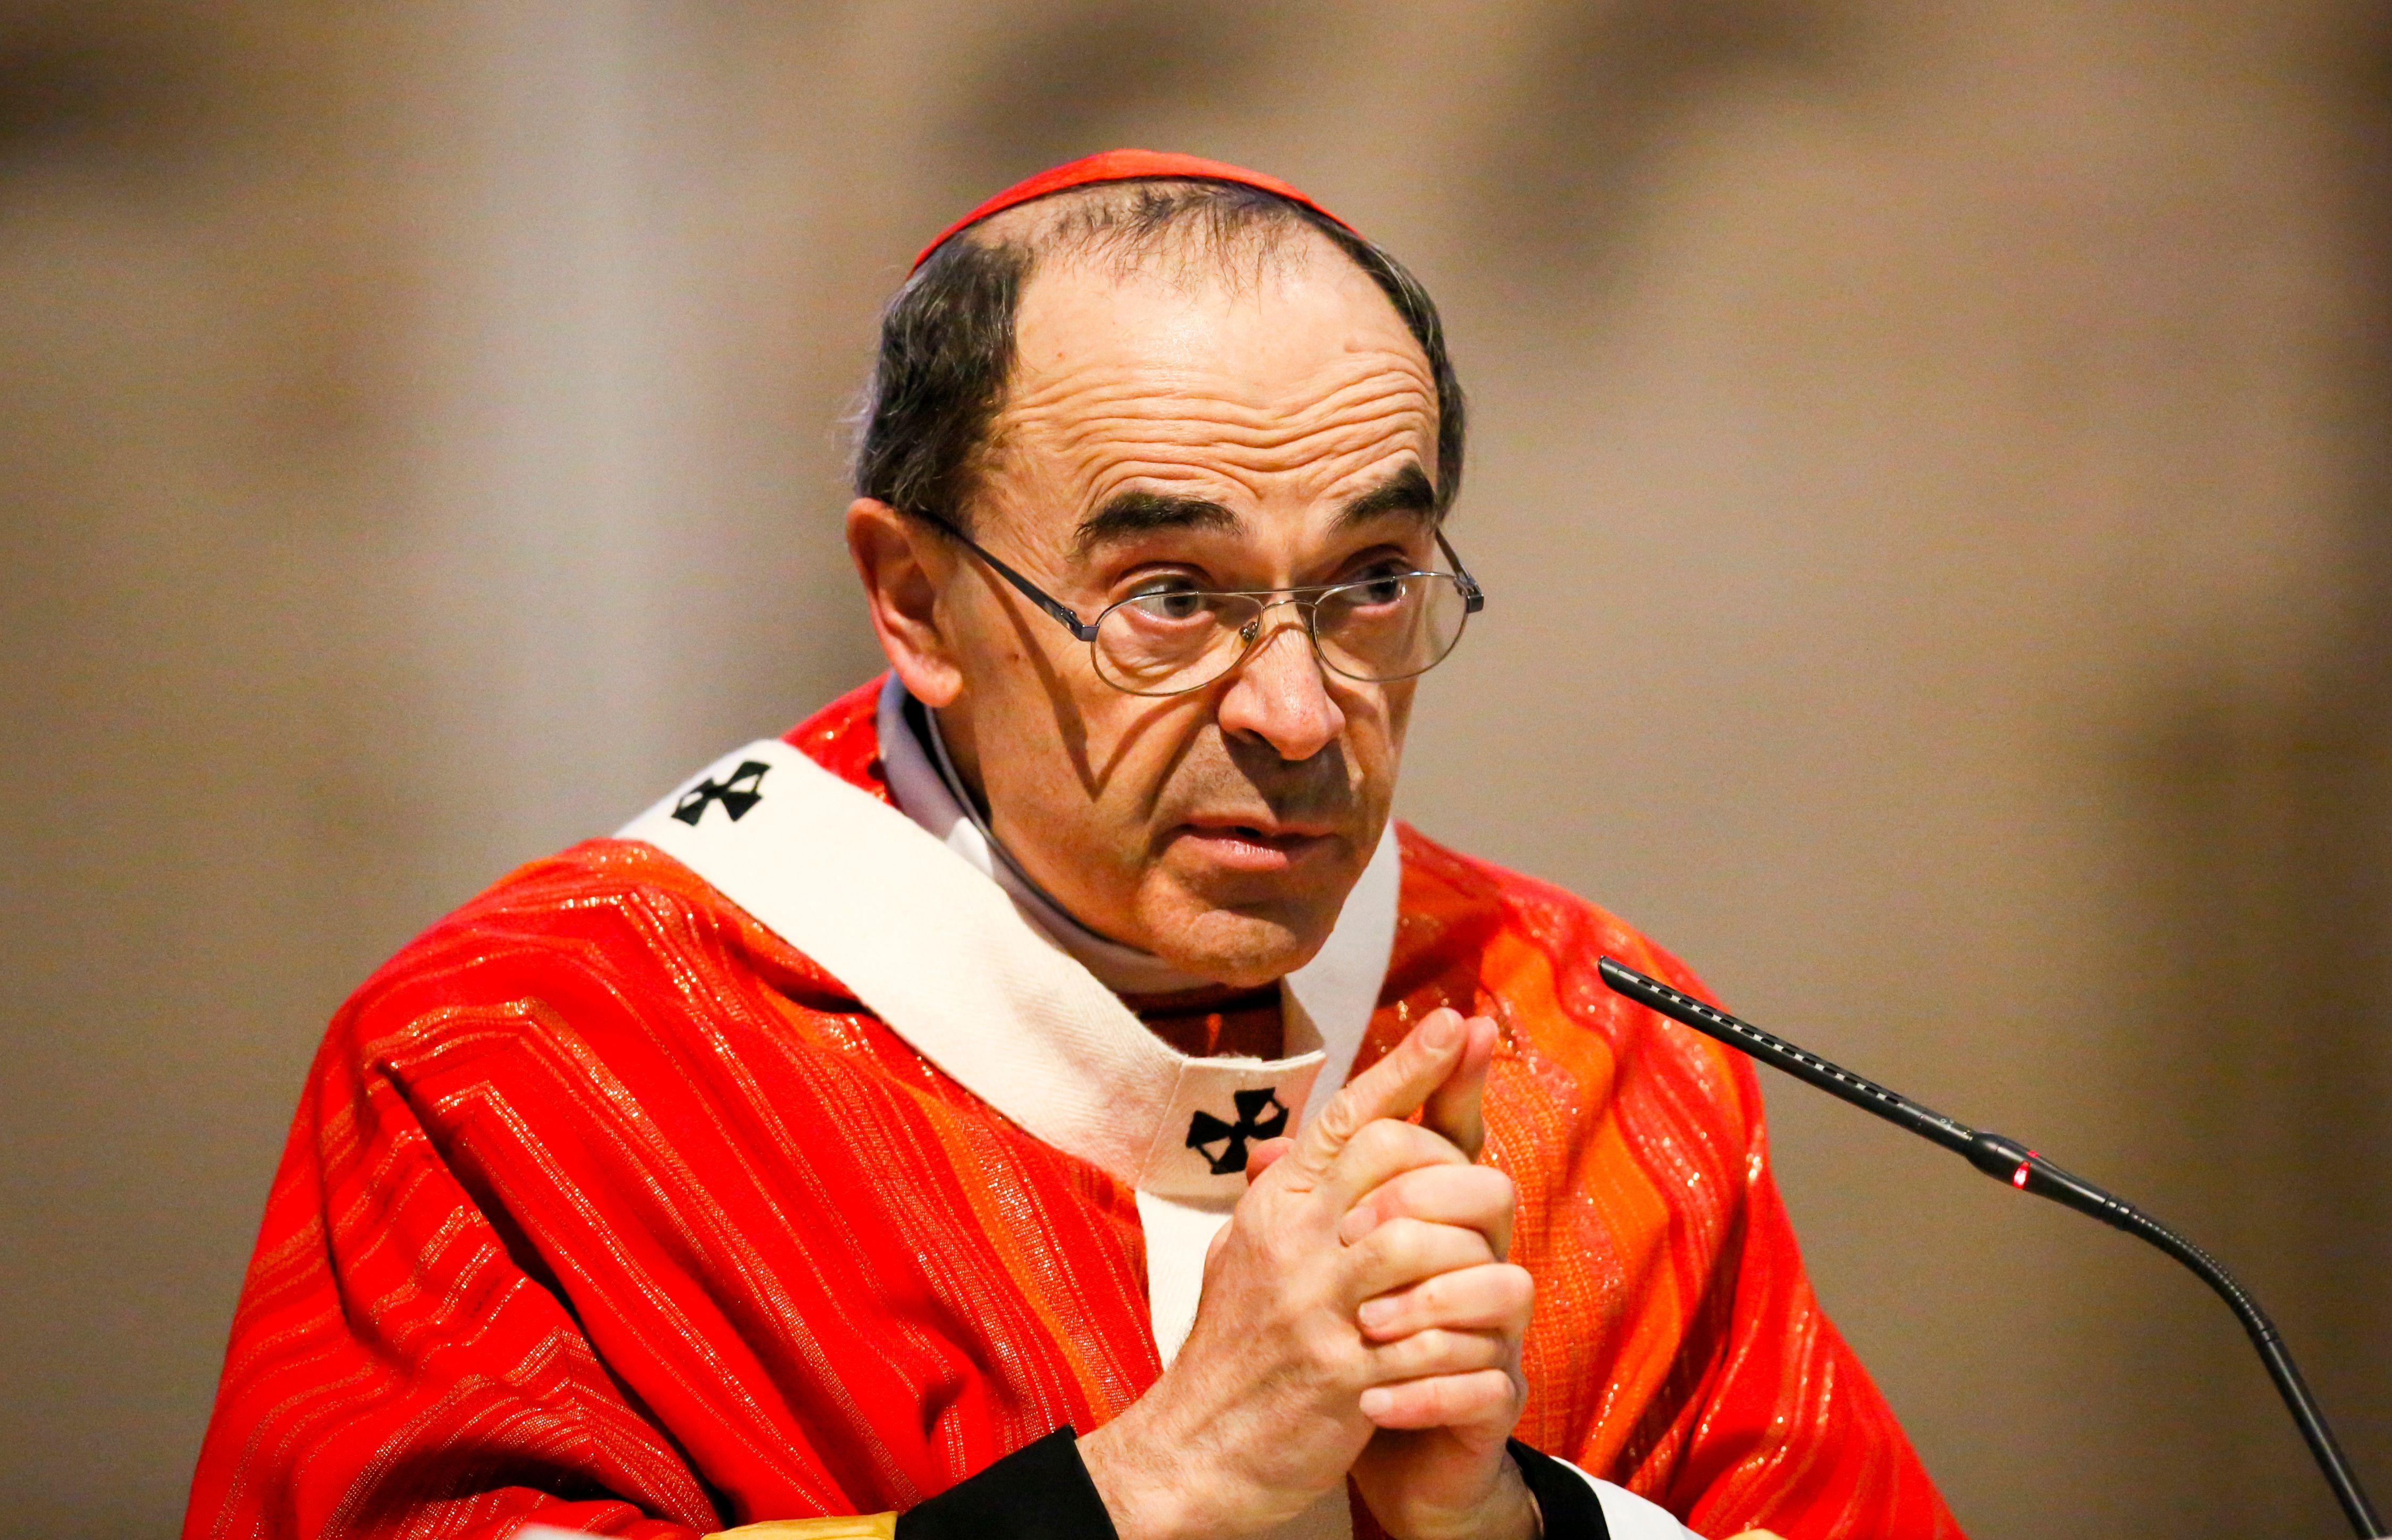 Eglise : le cardinal Barbarin entendu par la police